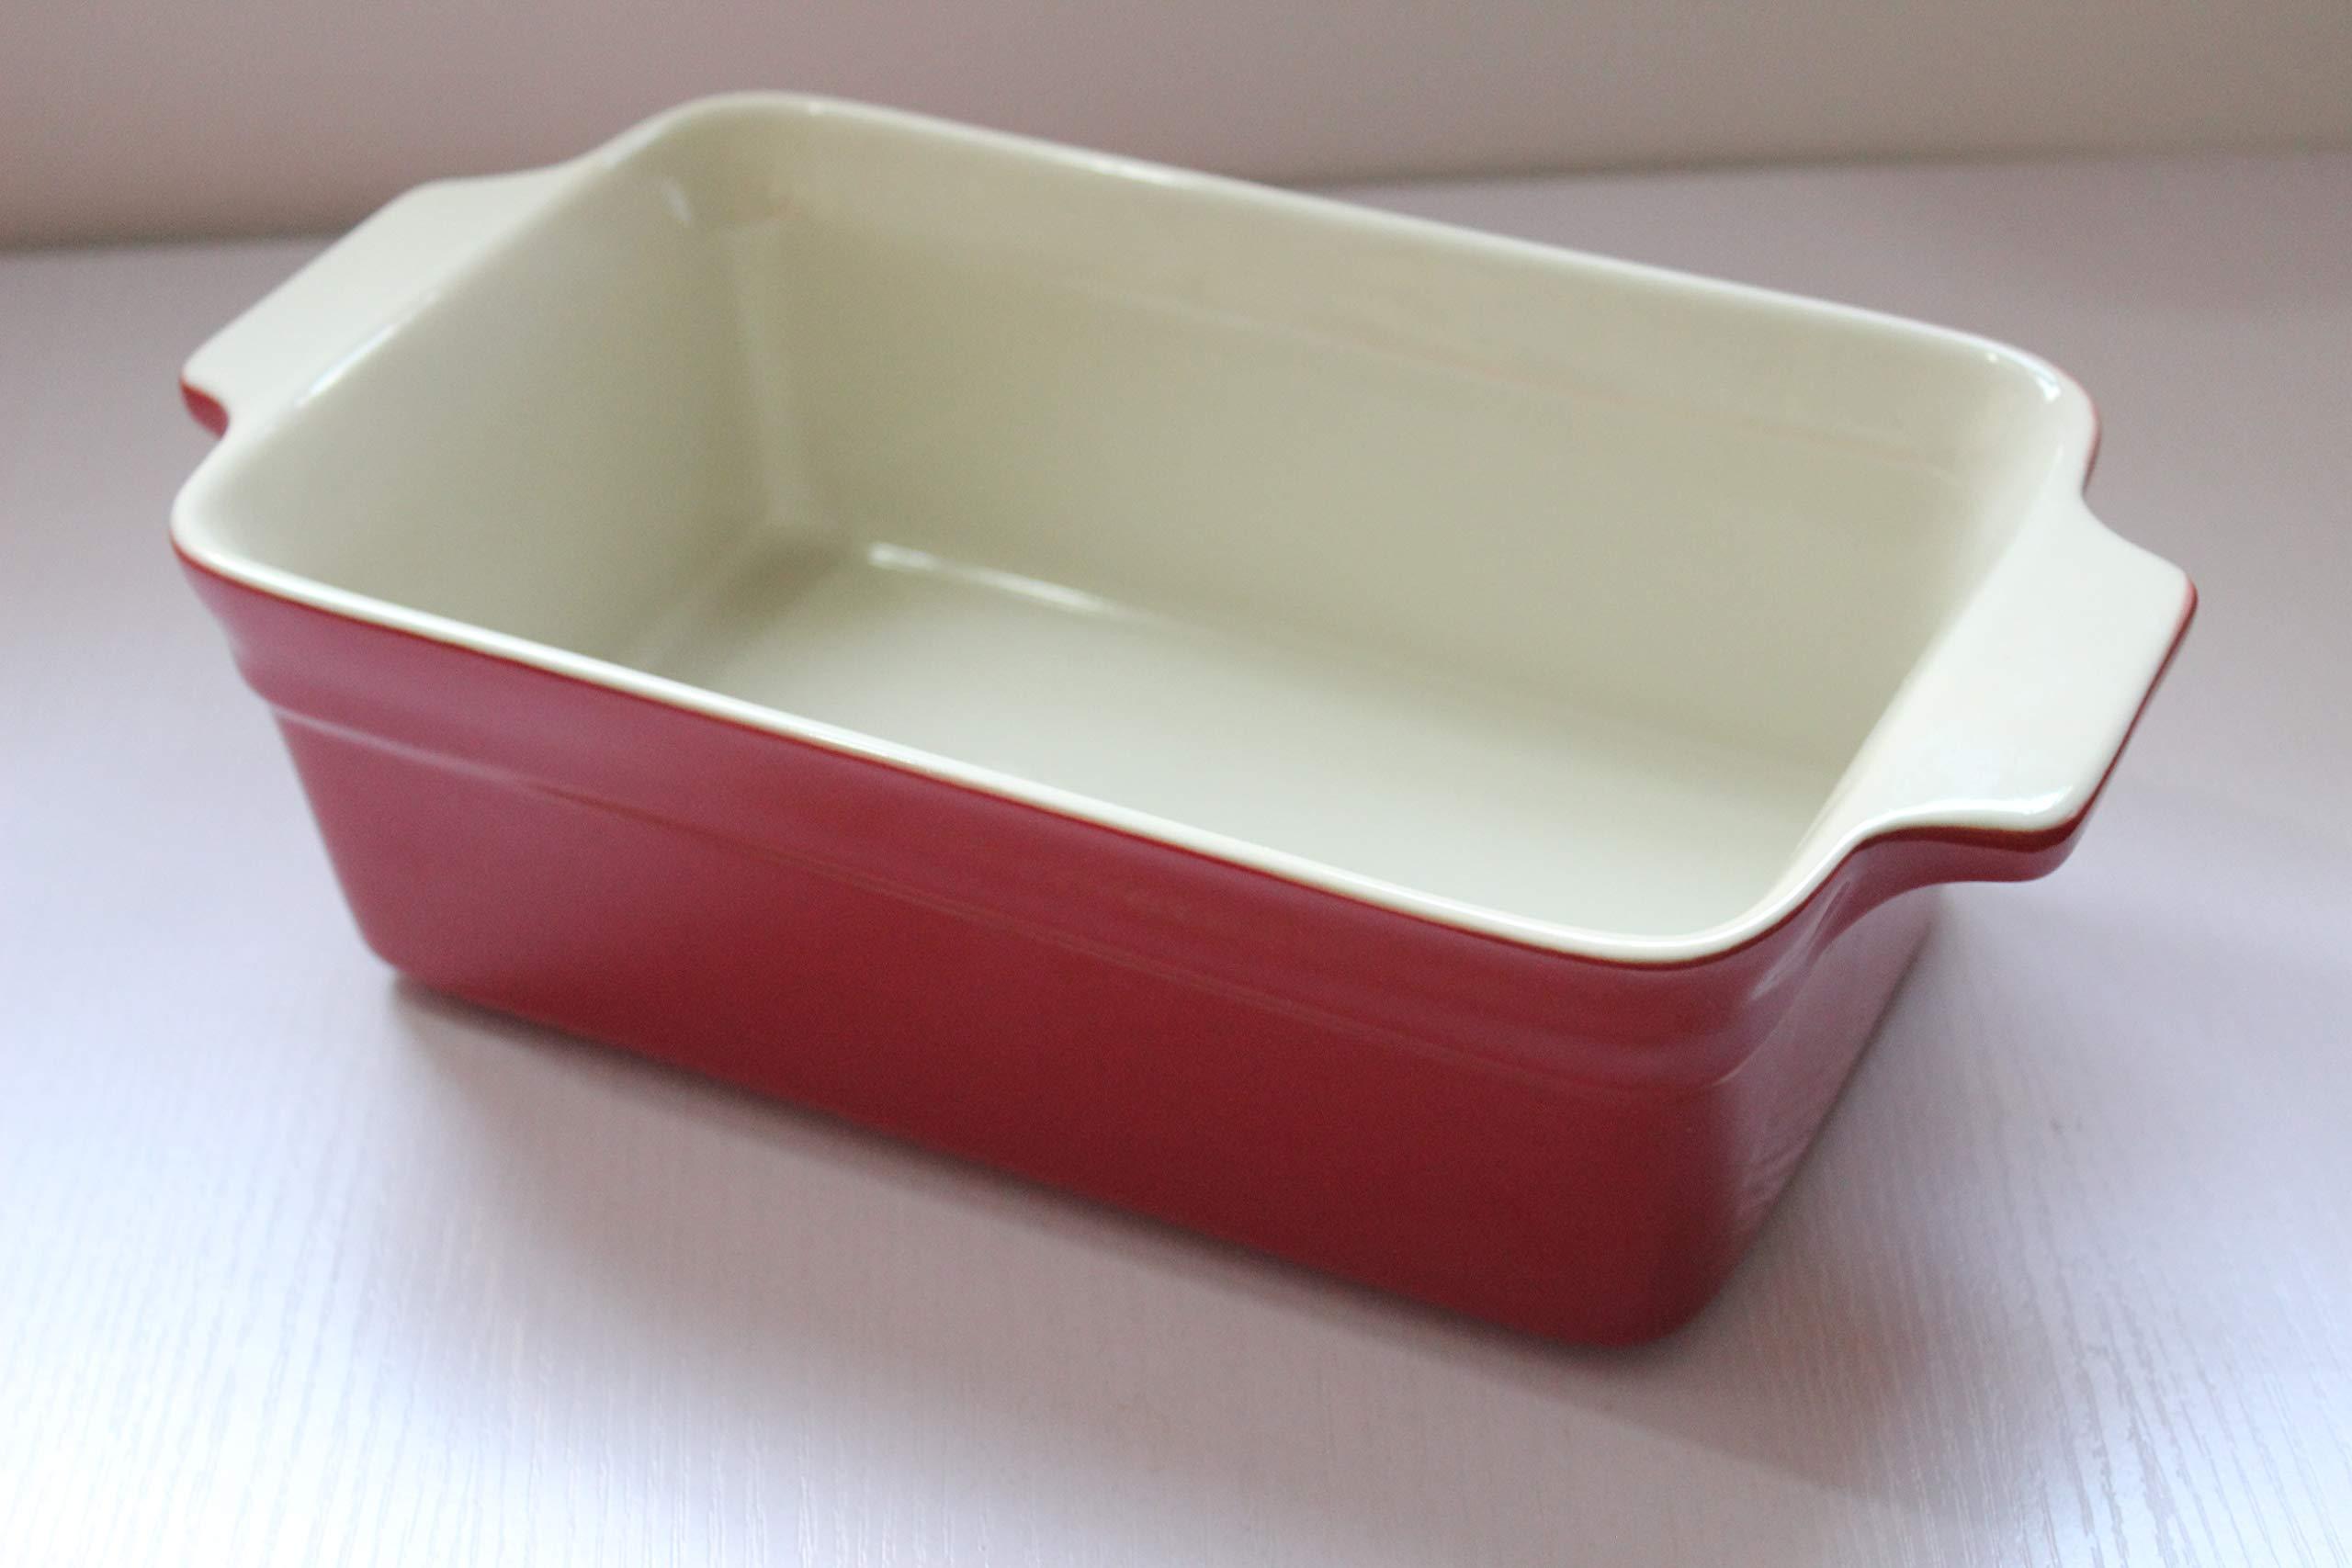 Lonovel Rectangular Baking Dish Roasting Lasagna Pan,11.5-Inch Classic Stoneware Ceramic Large Rectangular Bakers,Red by Lonovel (Image #4)